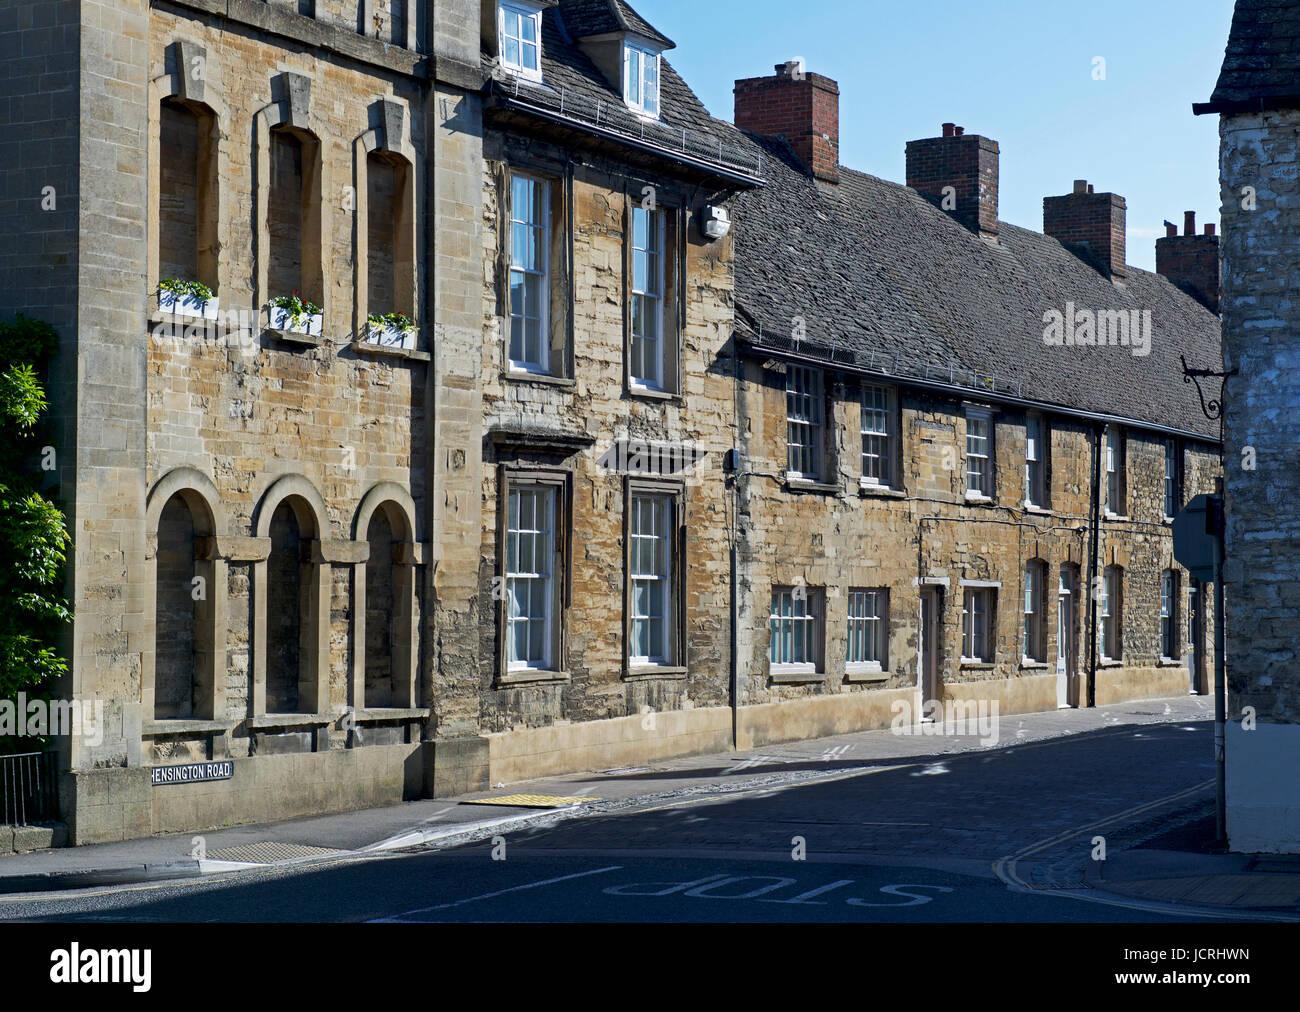 Street in Woodstock, Oxfordshire, England UK - Stock Image